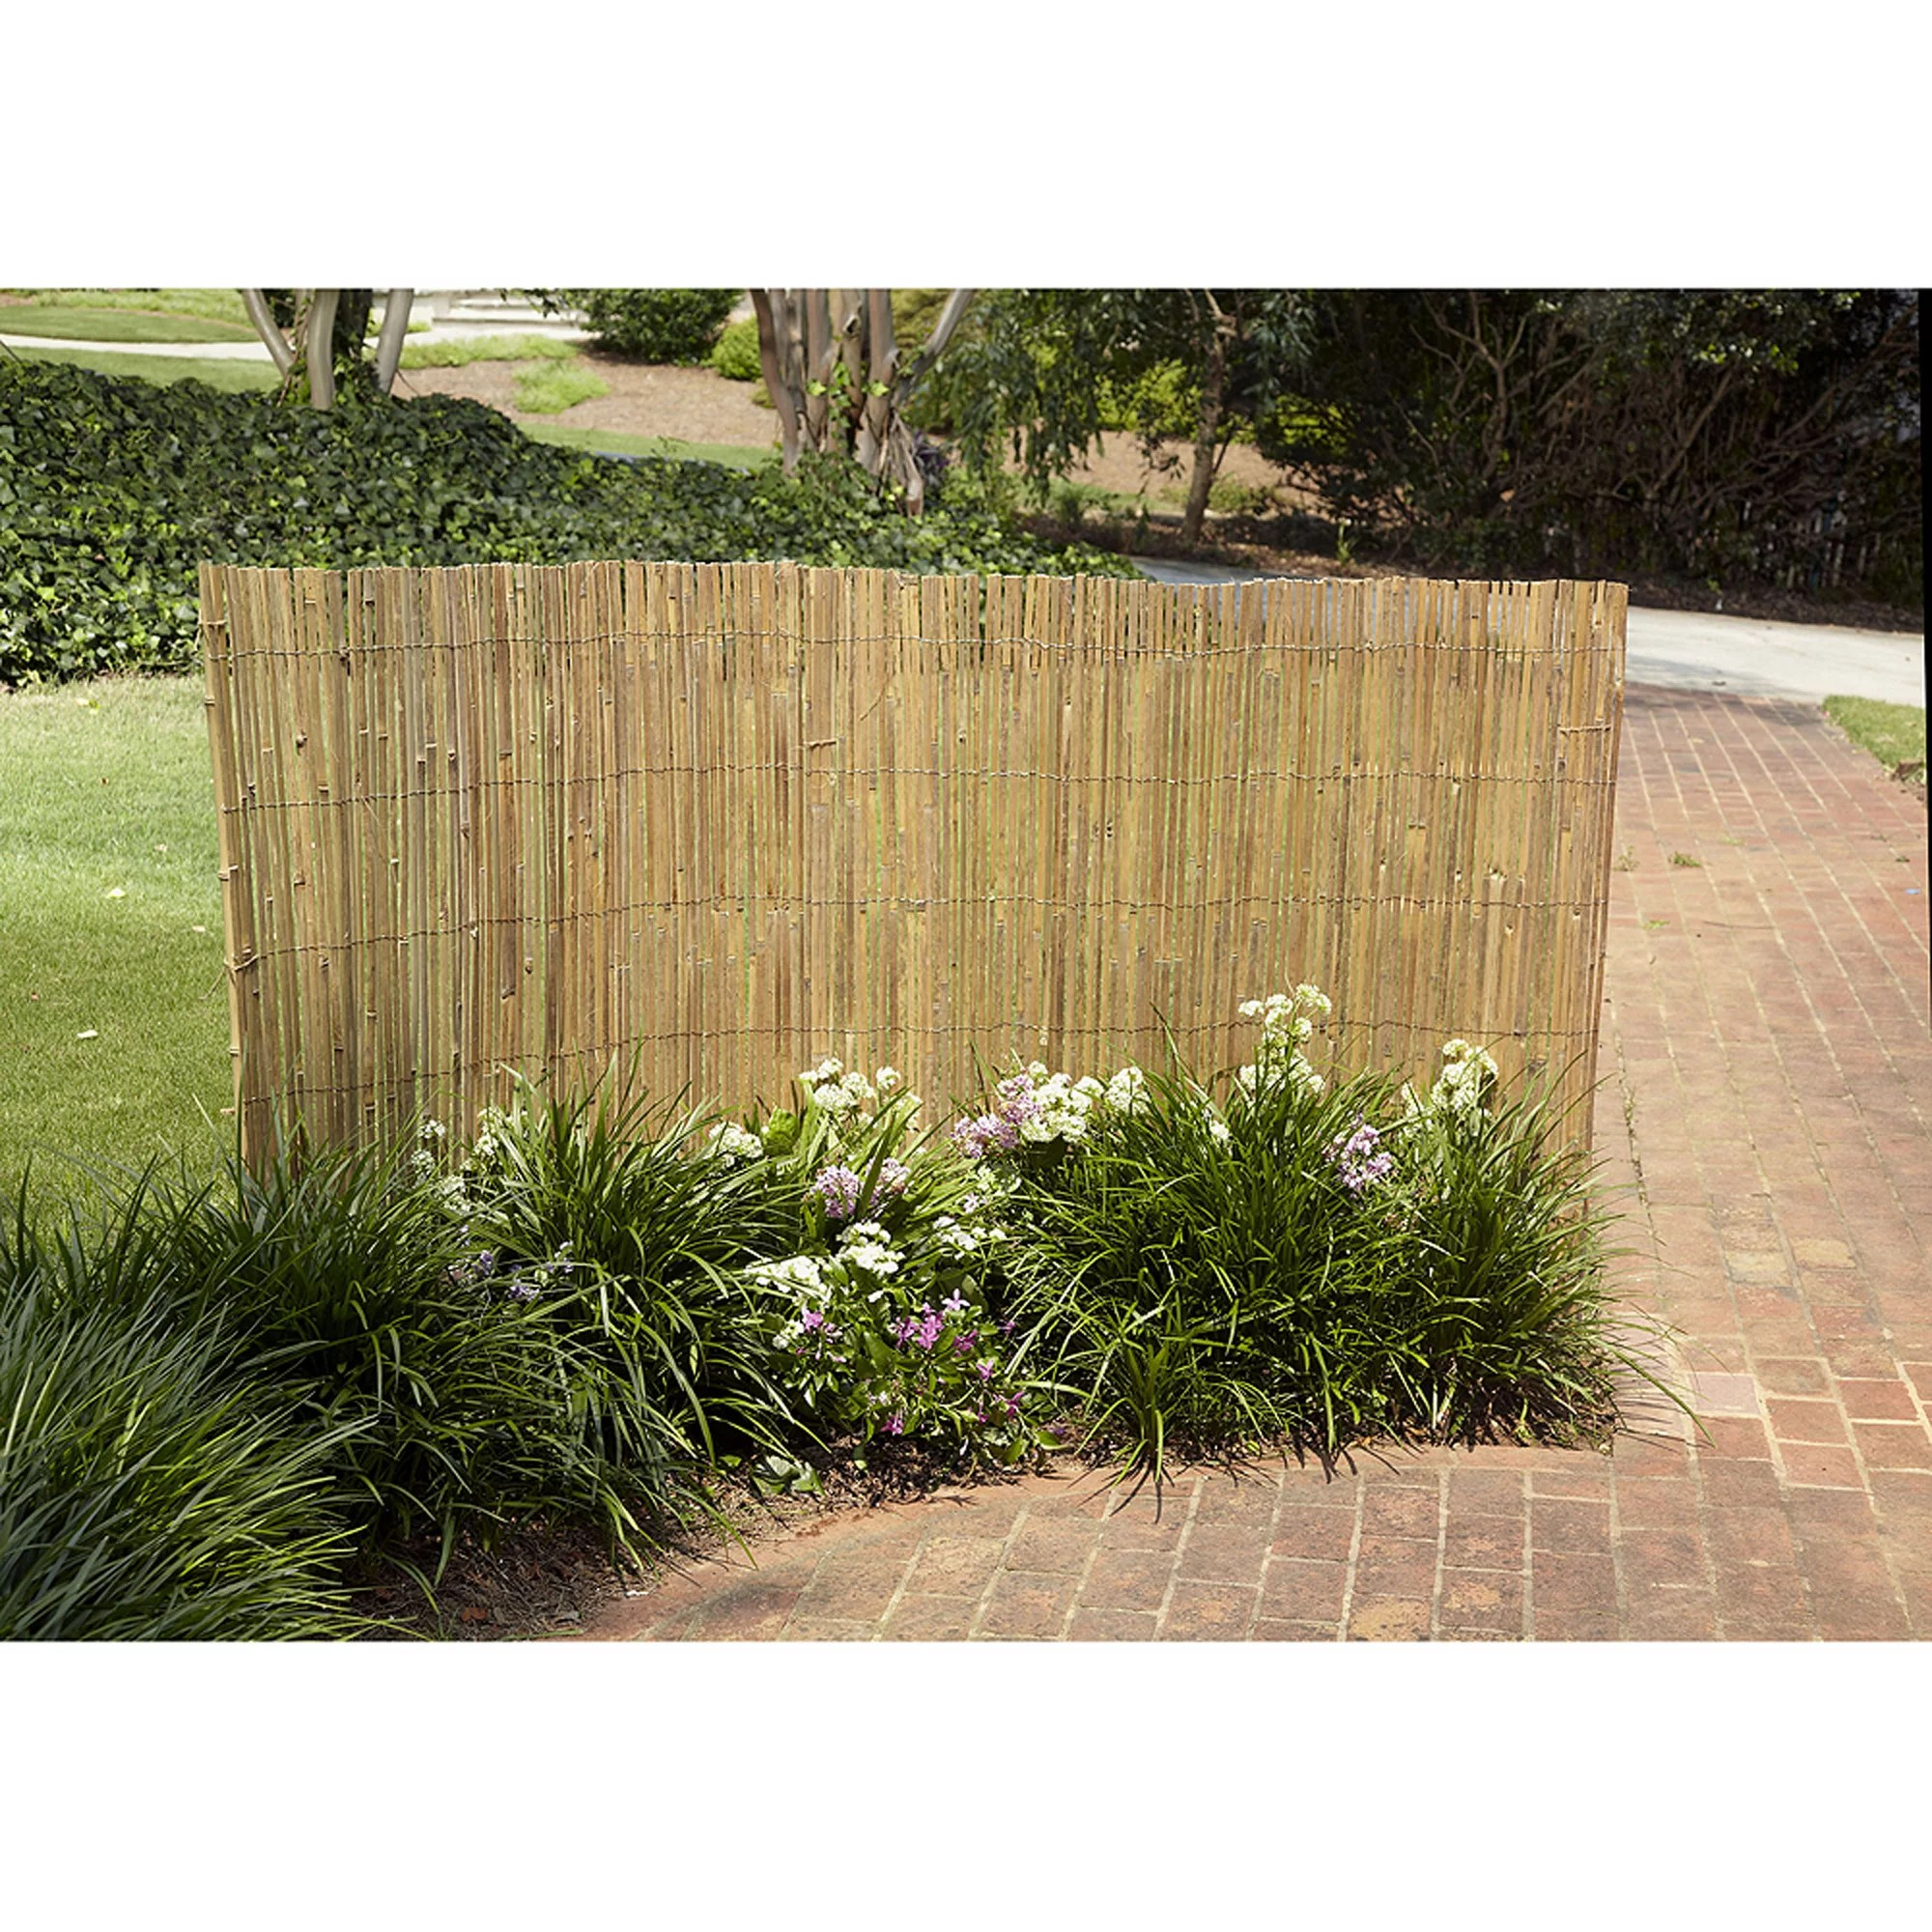 Gardenpath 1 2 In Outside Peel Bamboo Fence 4 Ft H X 8 Ft L Walmart Com Walmart Com